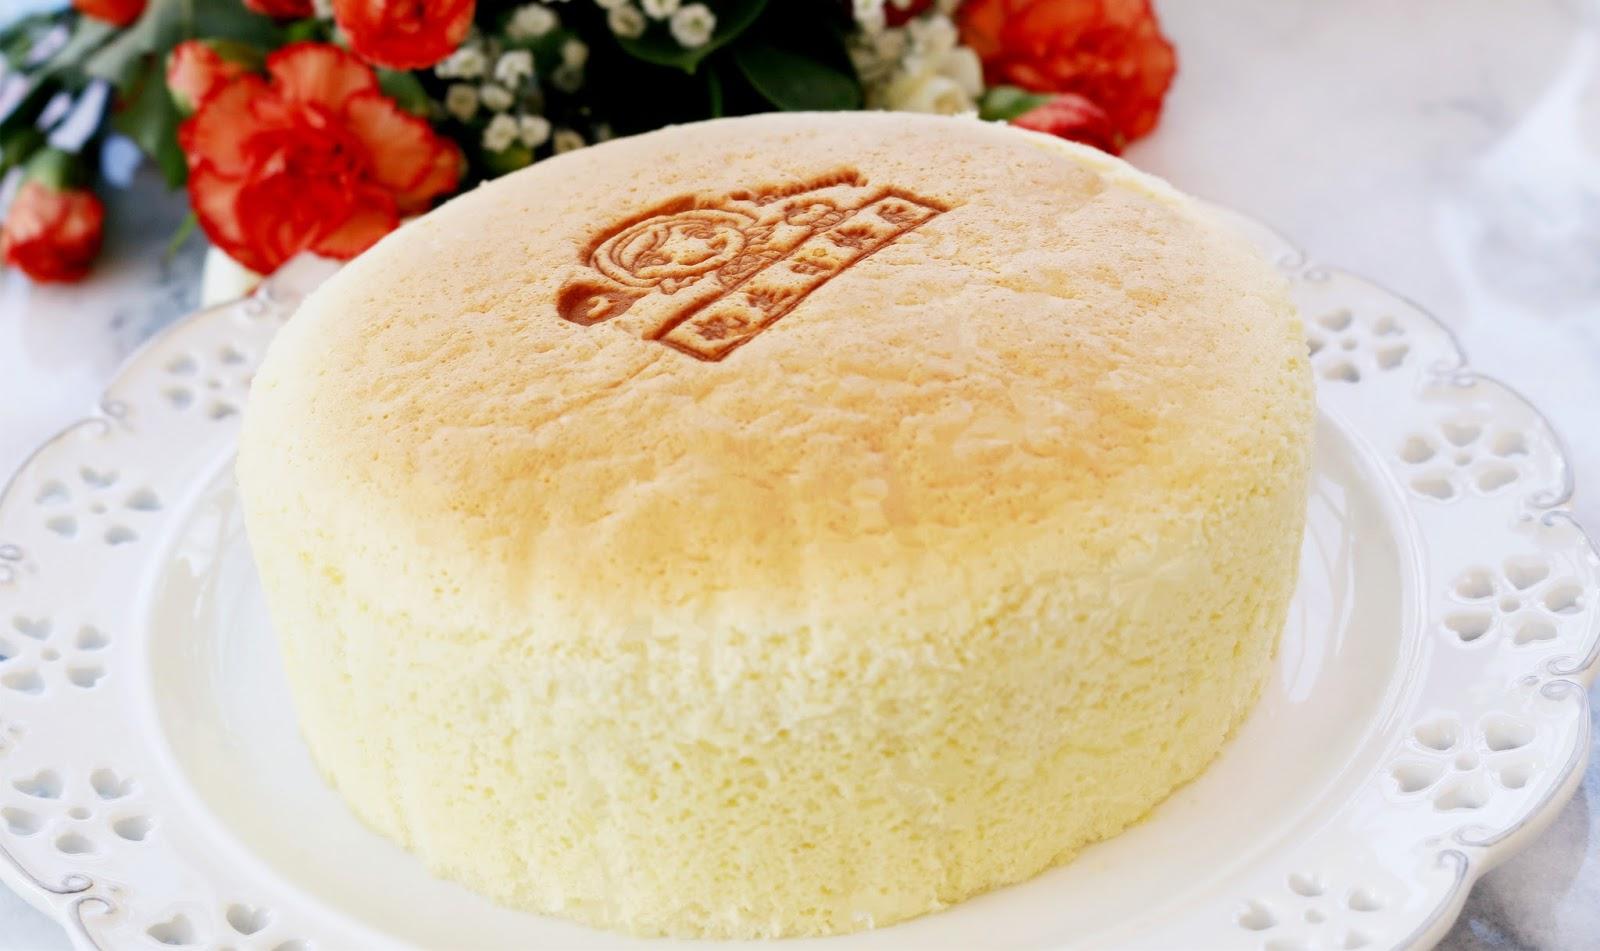 Sponge Cake Recipes With Vegetable Oil Uk